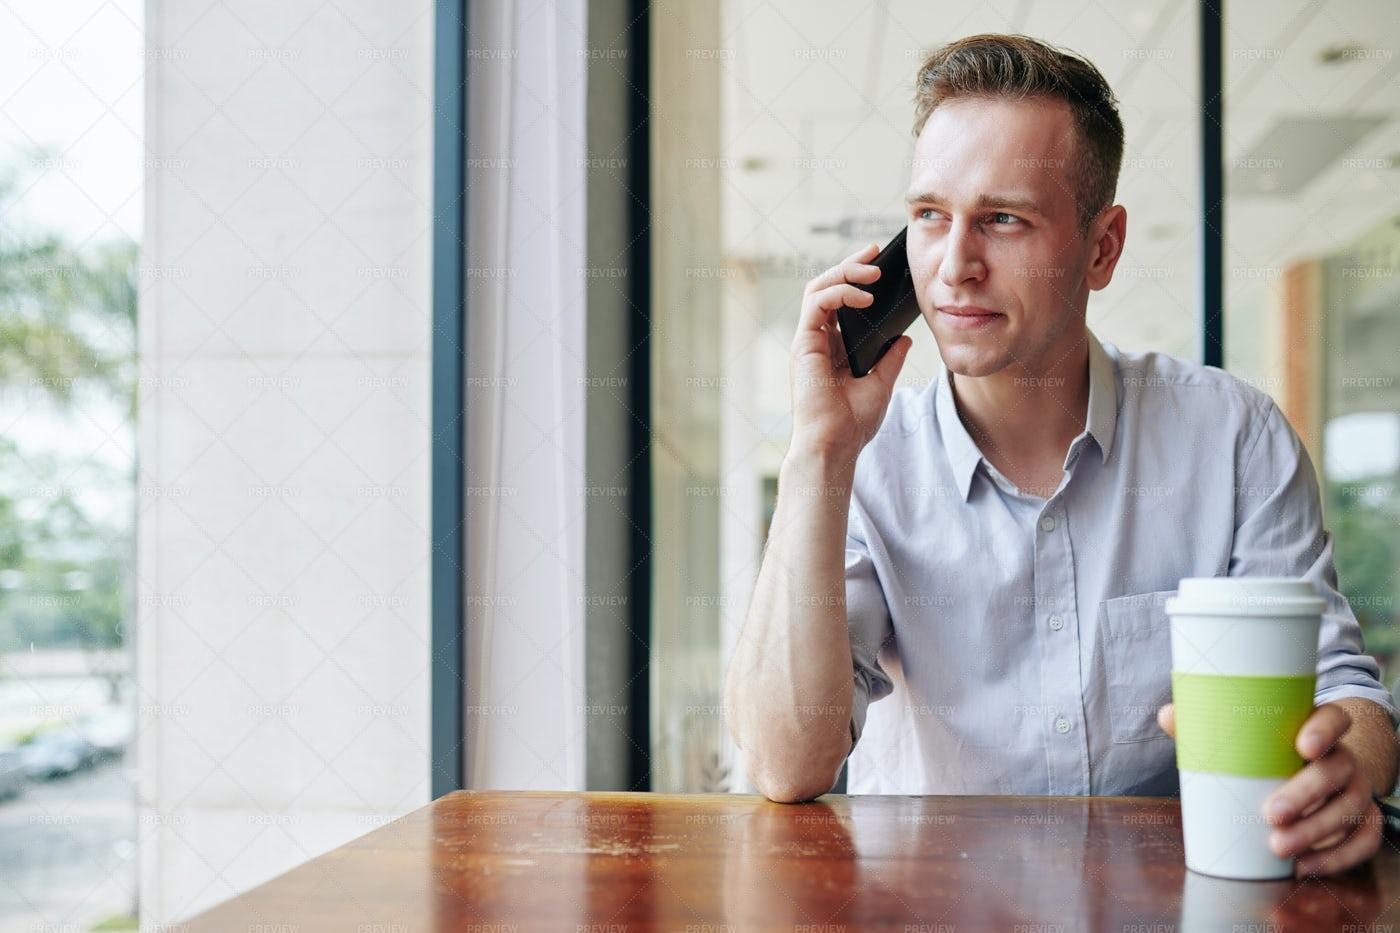 Young Man Talking On Phone: Stock Photos